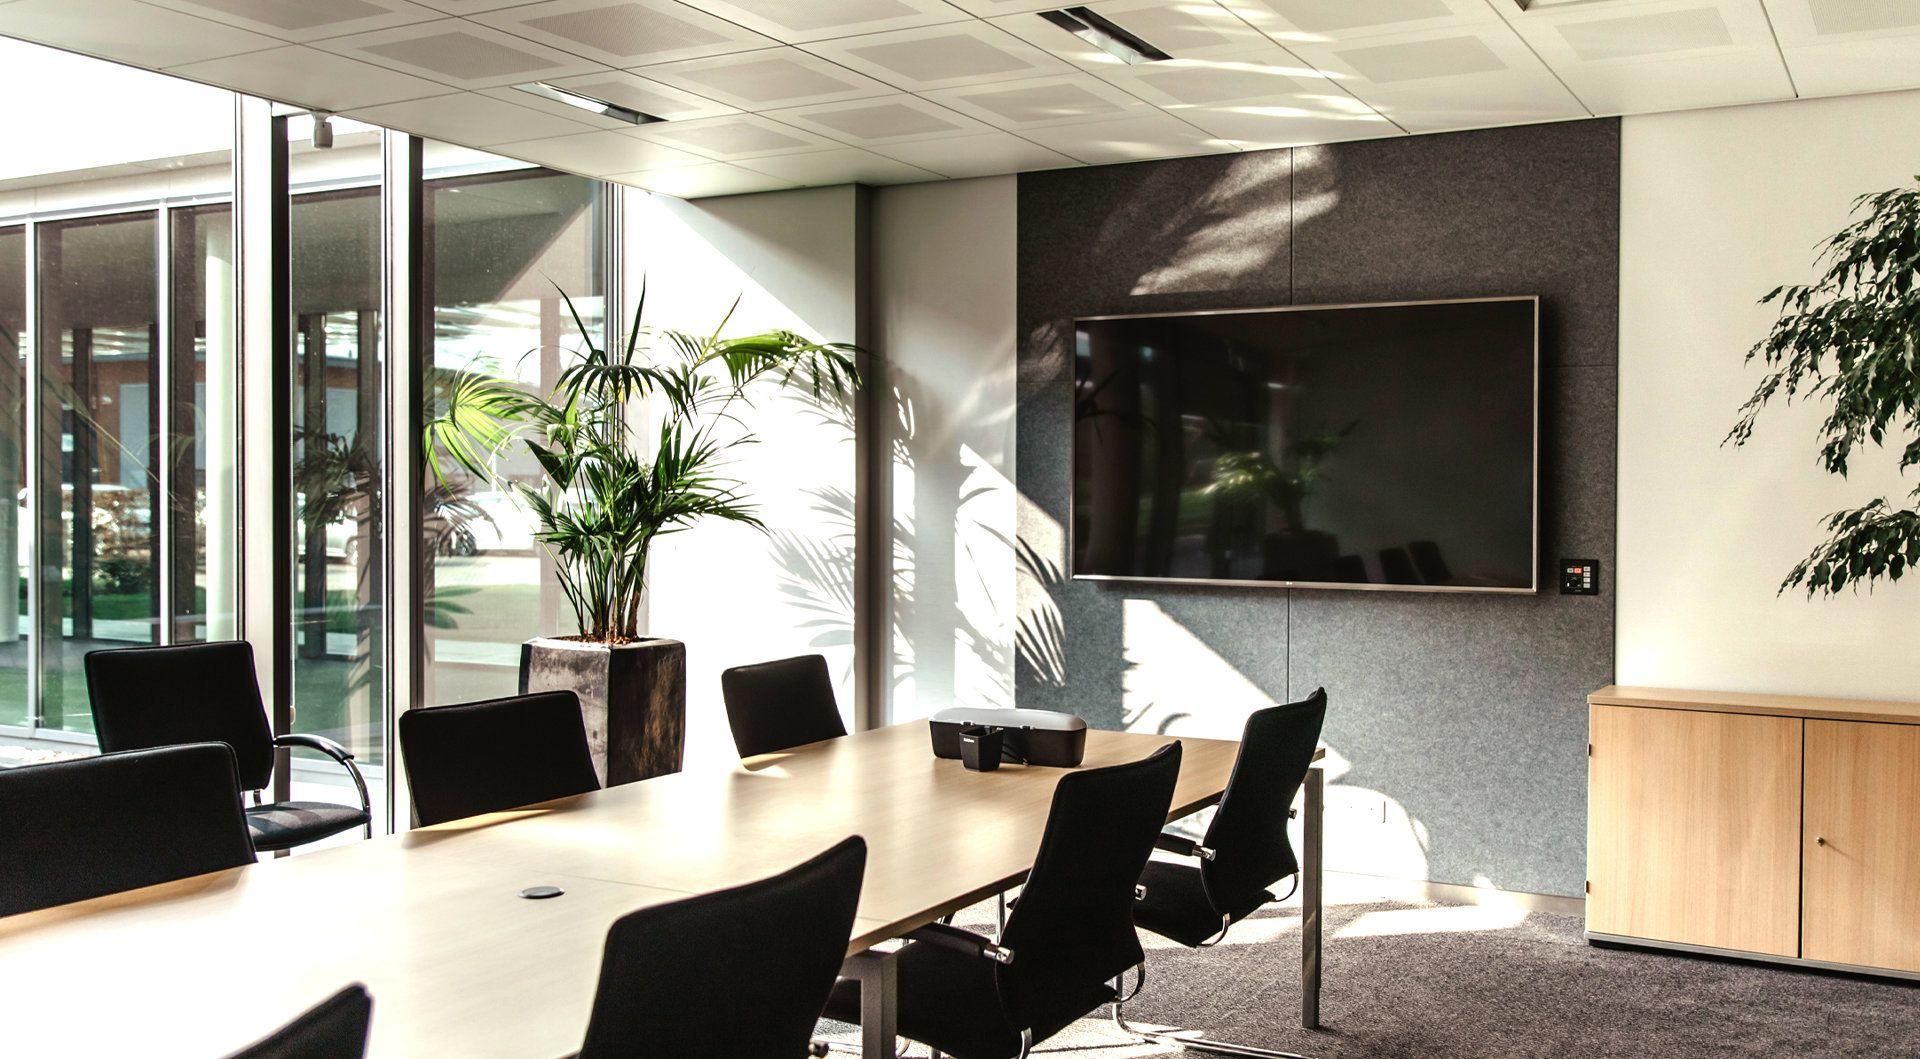 "Conen Mounts SCETAWL flat panel muur steun 2,54 m (100"") Aluminium, Zwart - Case studie de vries"